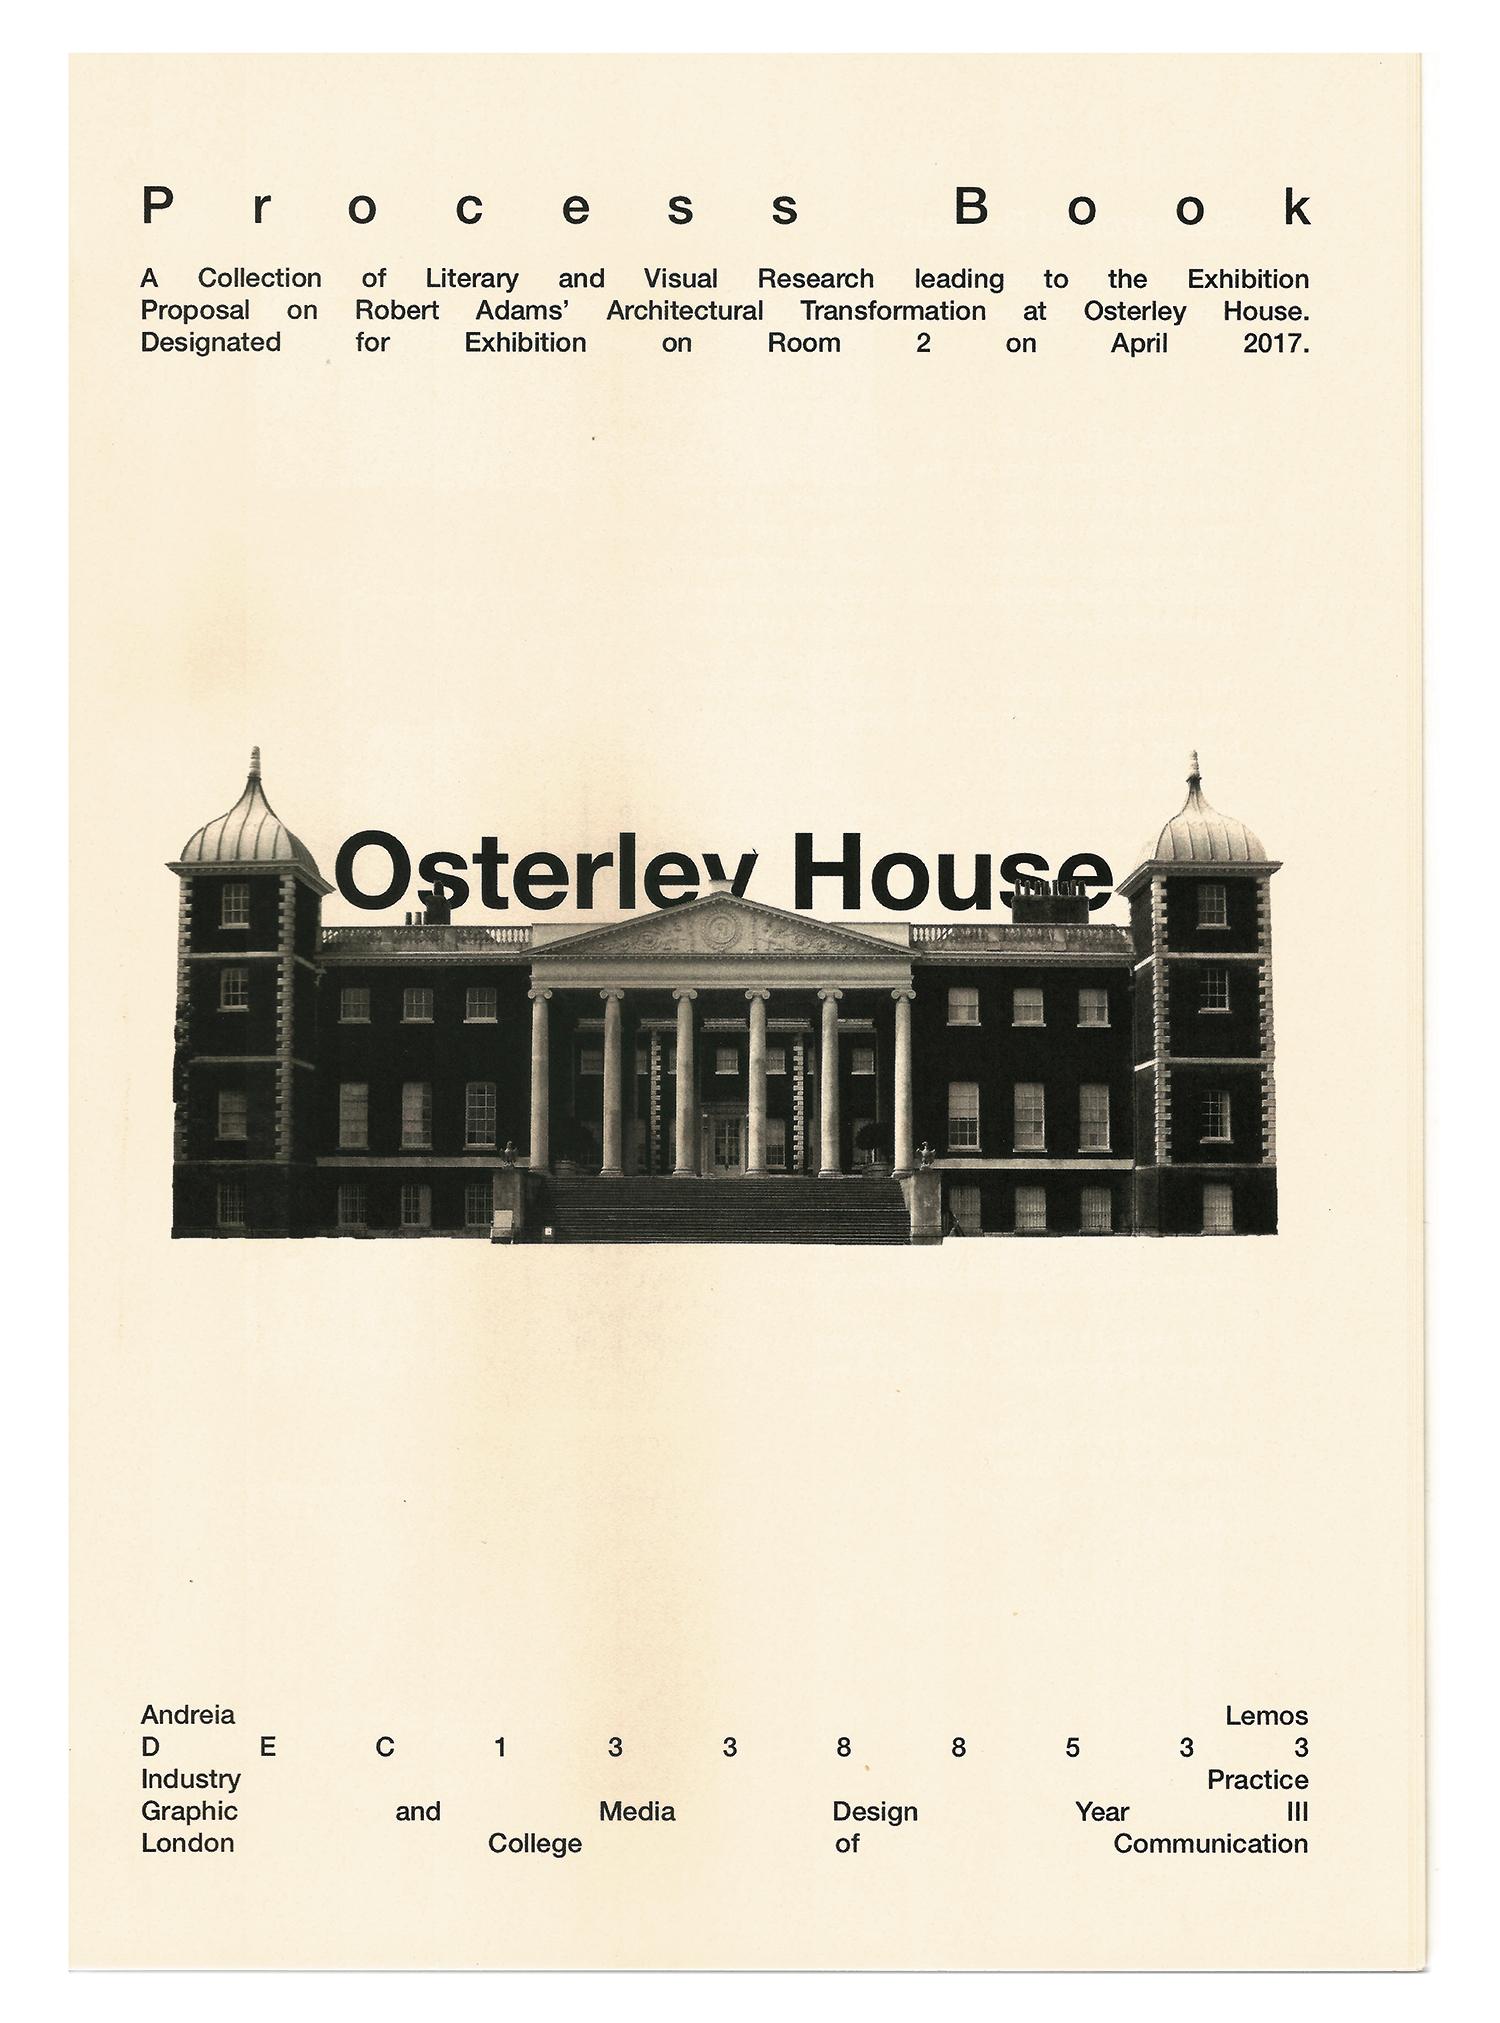 osterley publishing 3.jpg